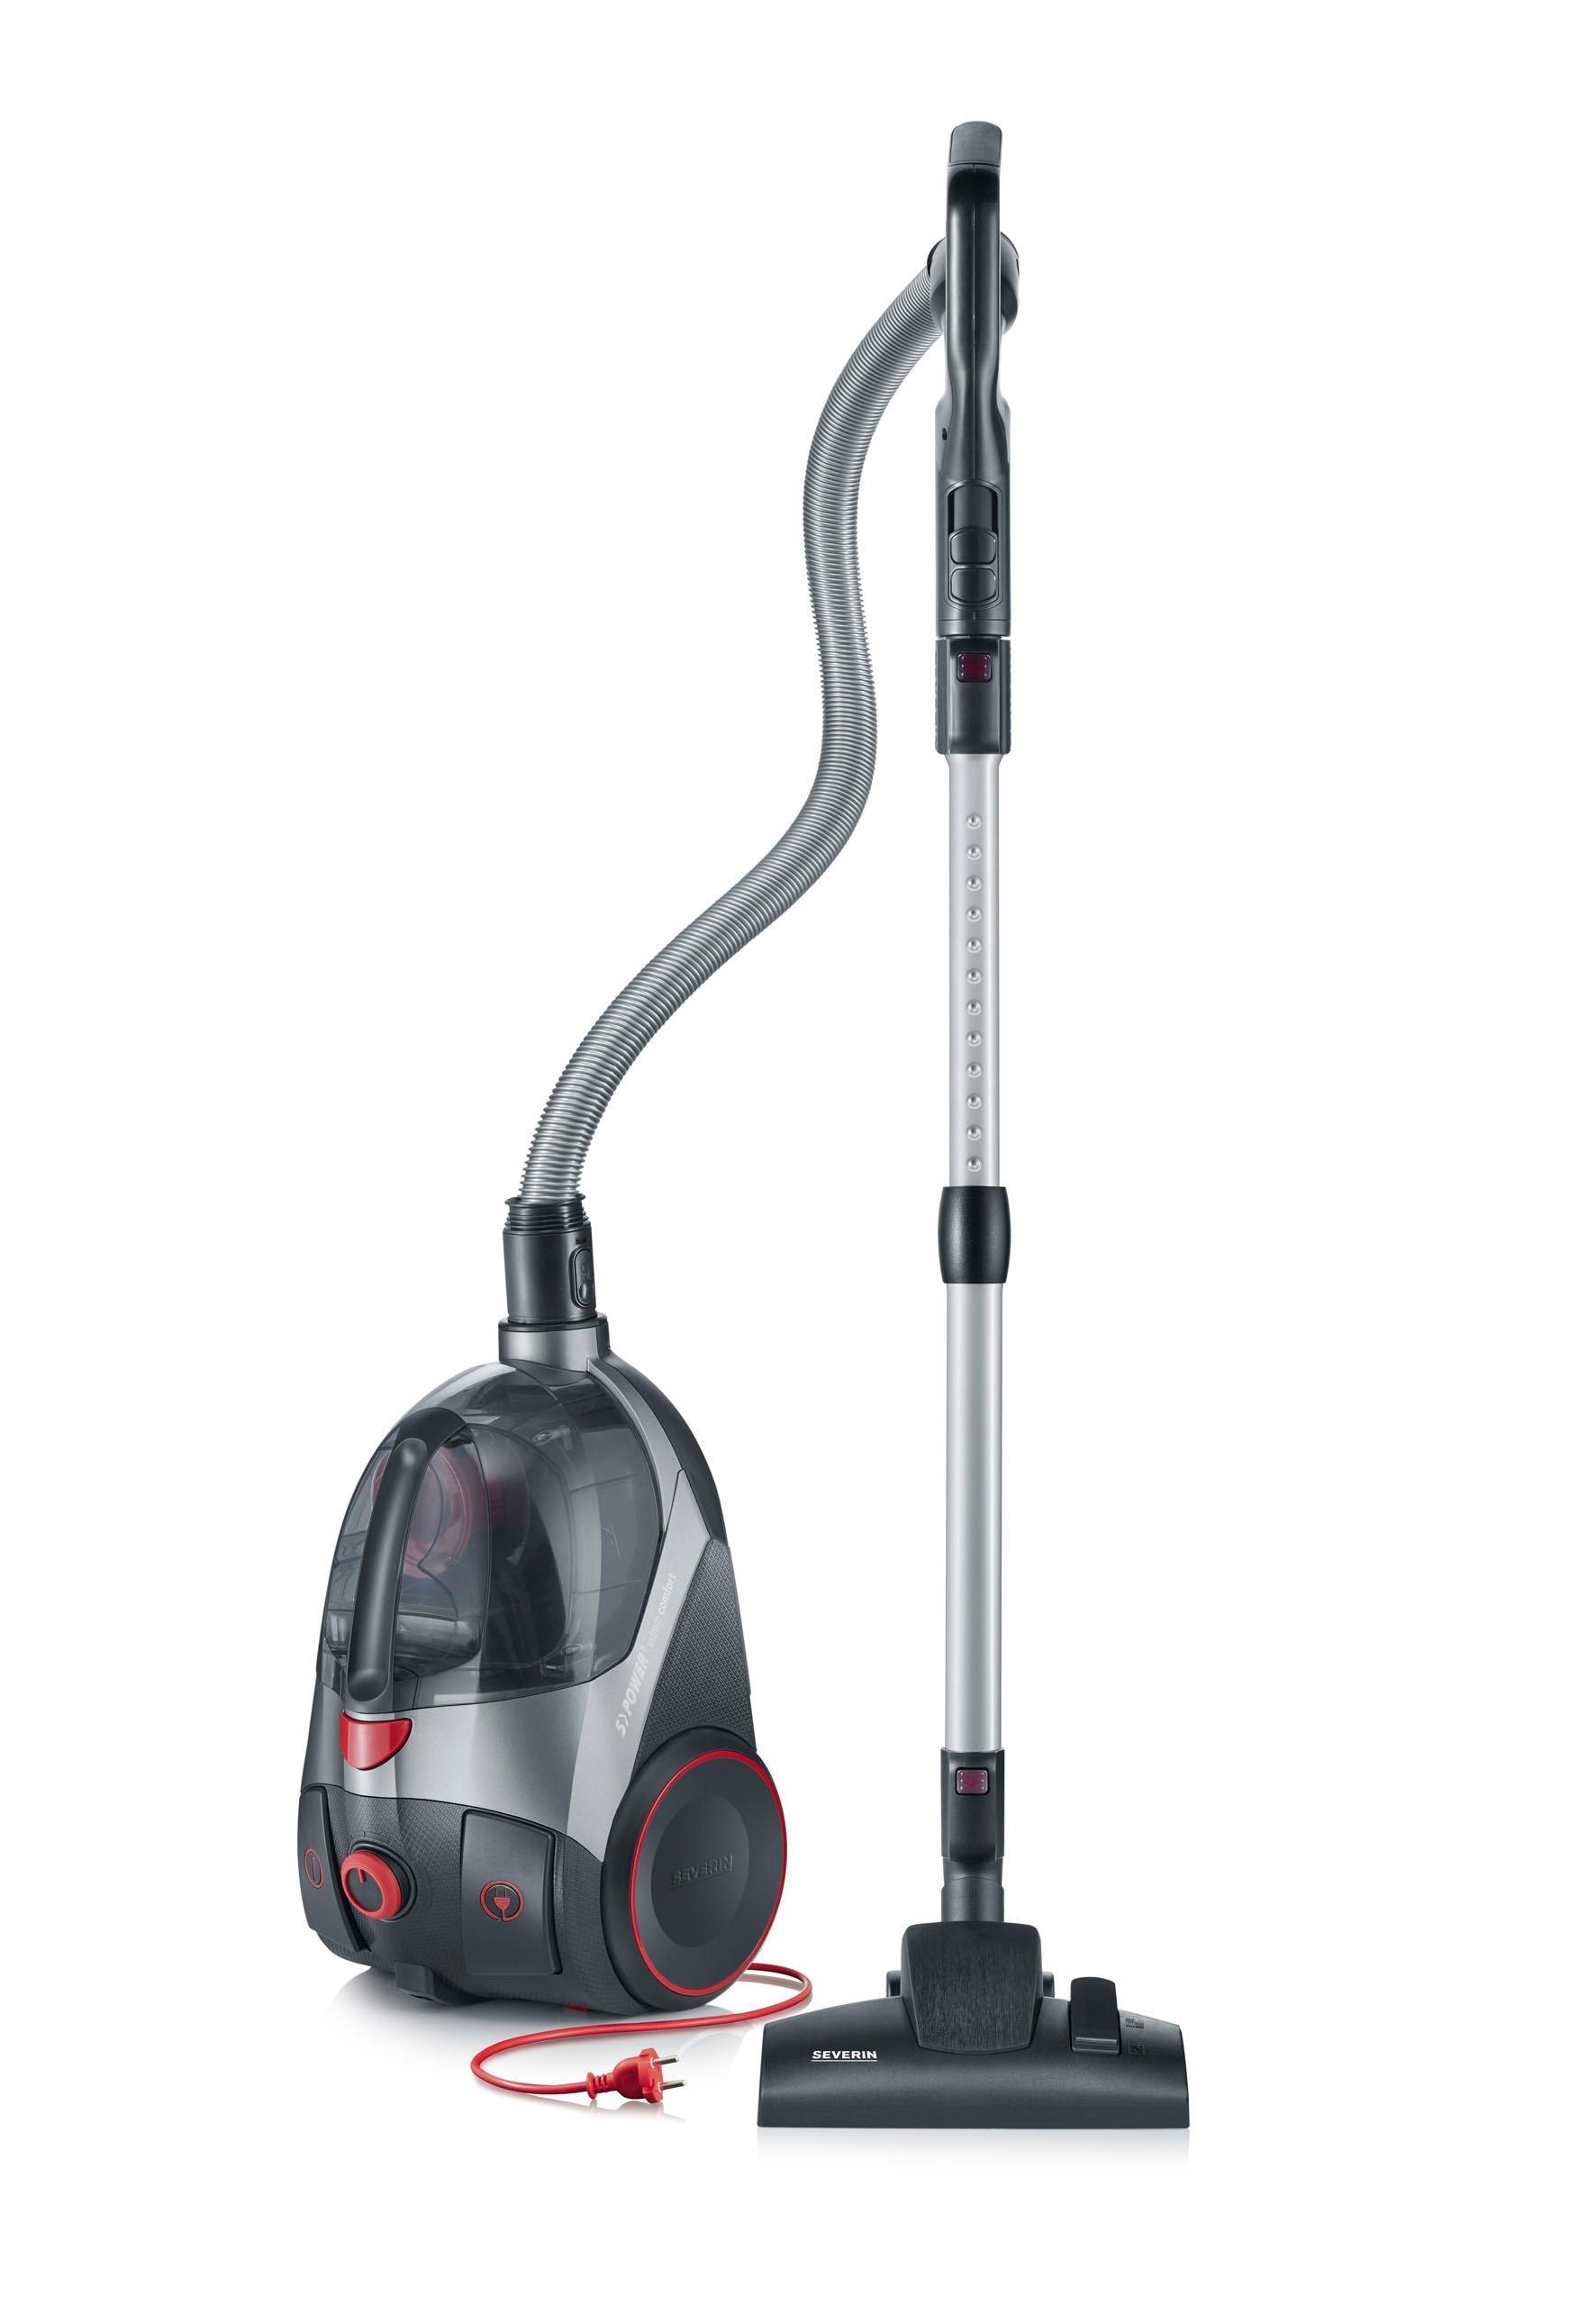 Severin Bodenstaubsauger S´Power extrem comfort - CY 7087 750 Watt beutellos   Flur & Diele > Haushaltsgeräte > Staubsauger   Grau   Severin